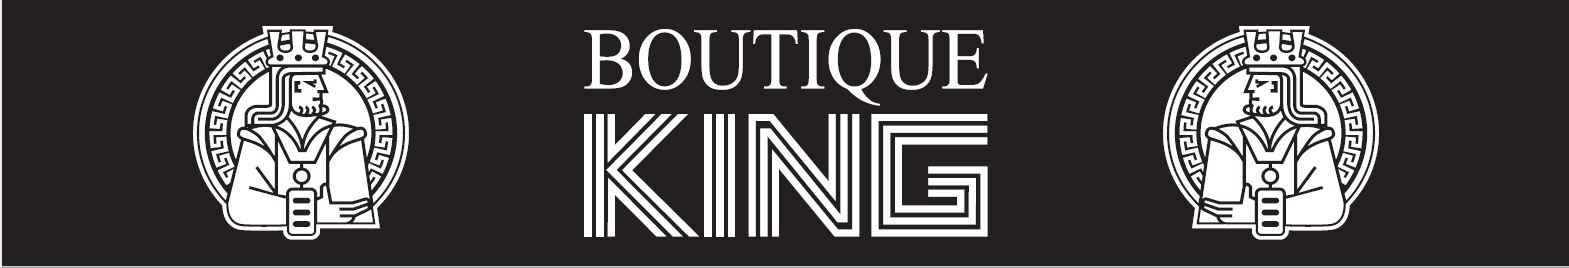 Boutique King